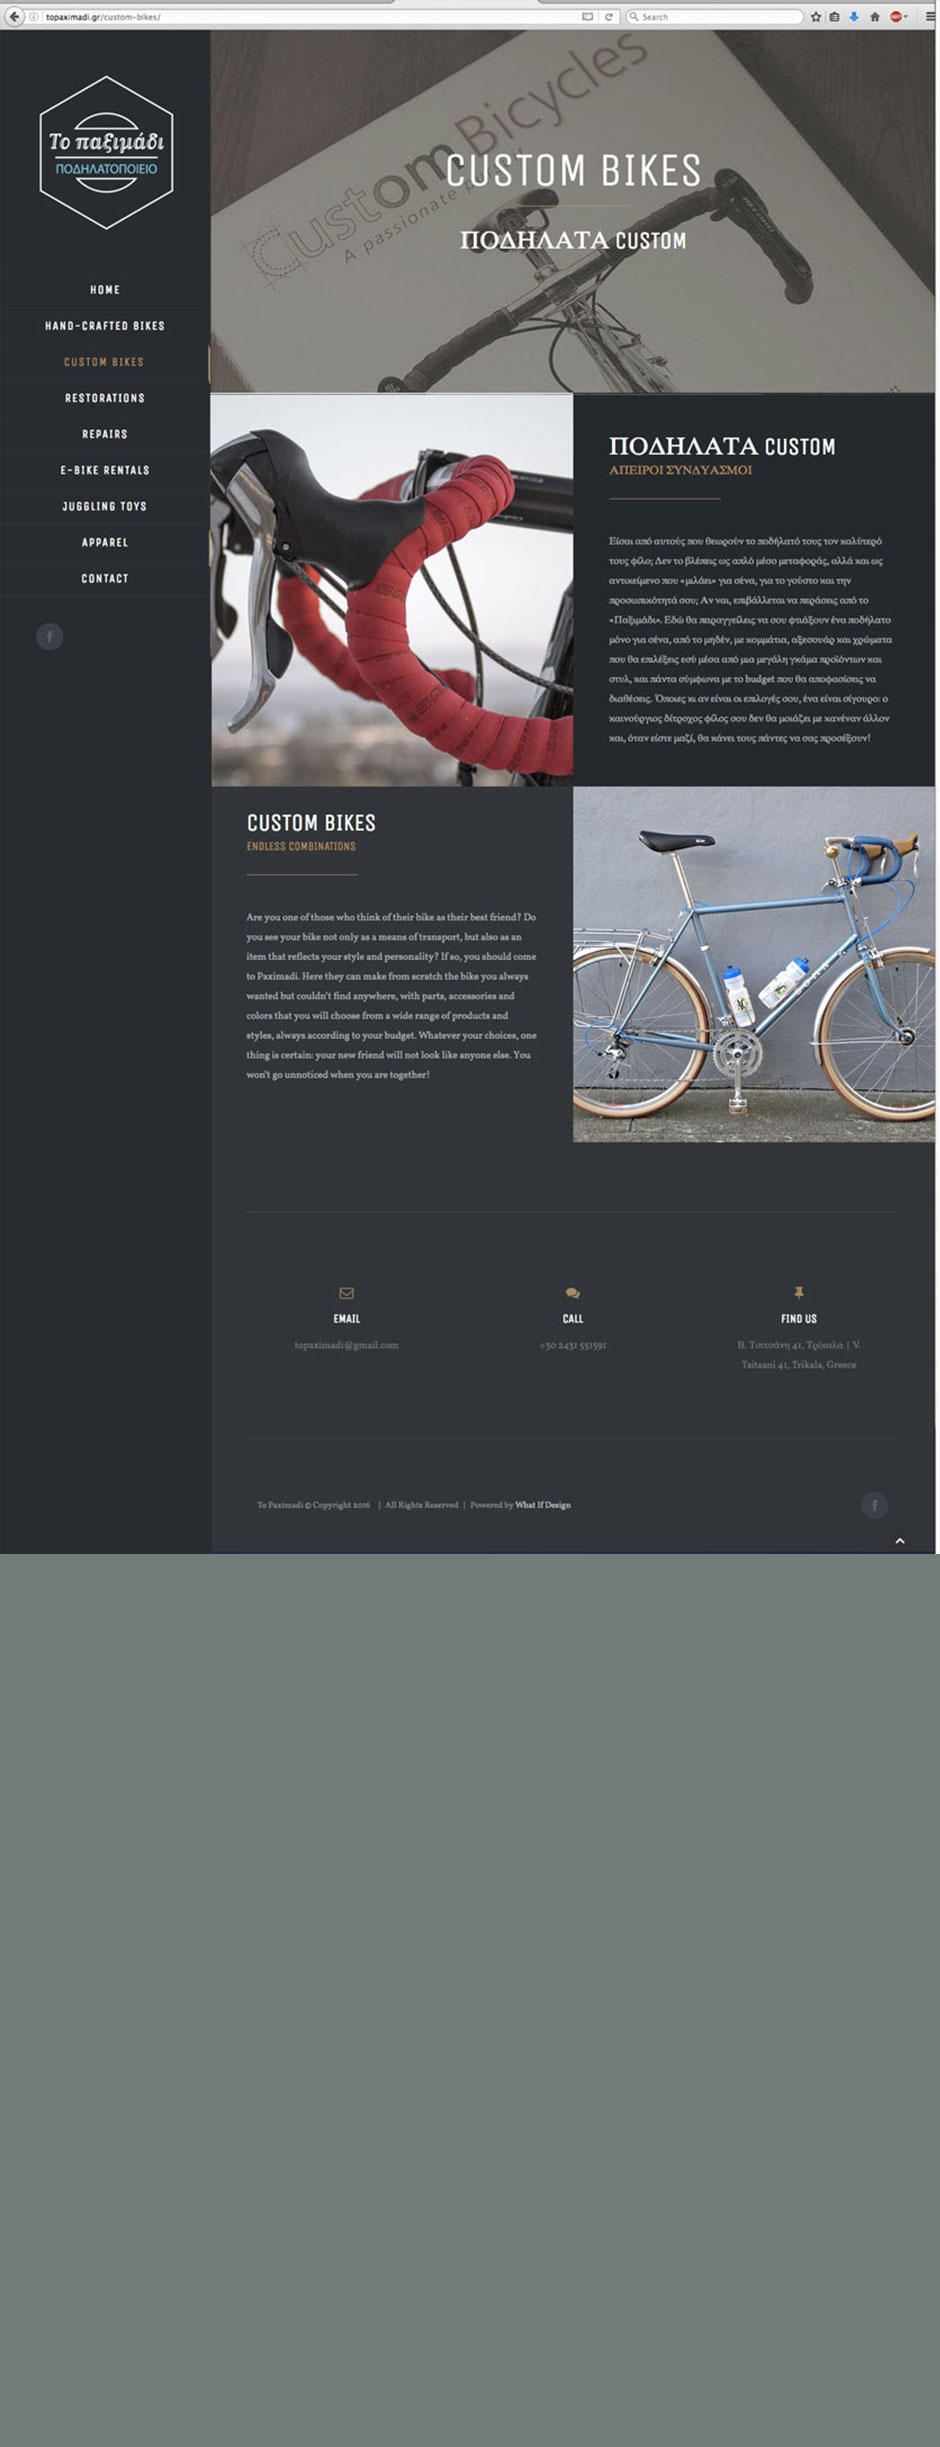 topaximadi - bikeshop - site _ custom bikes site page